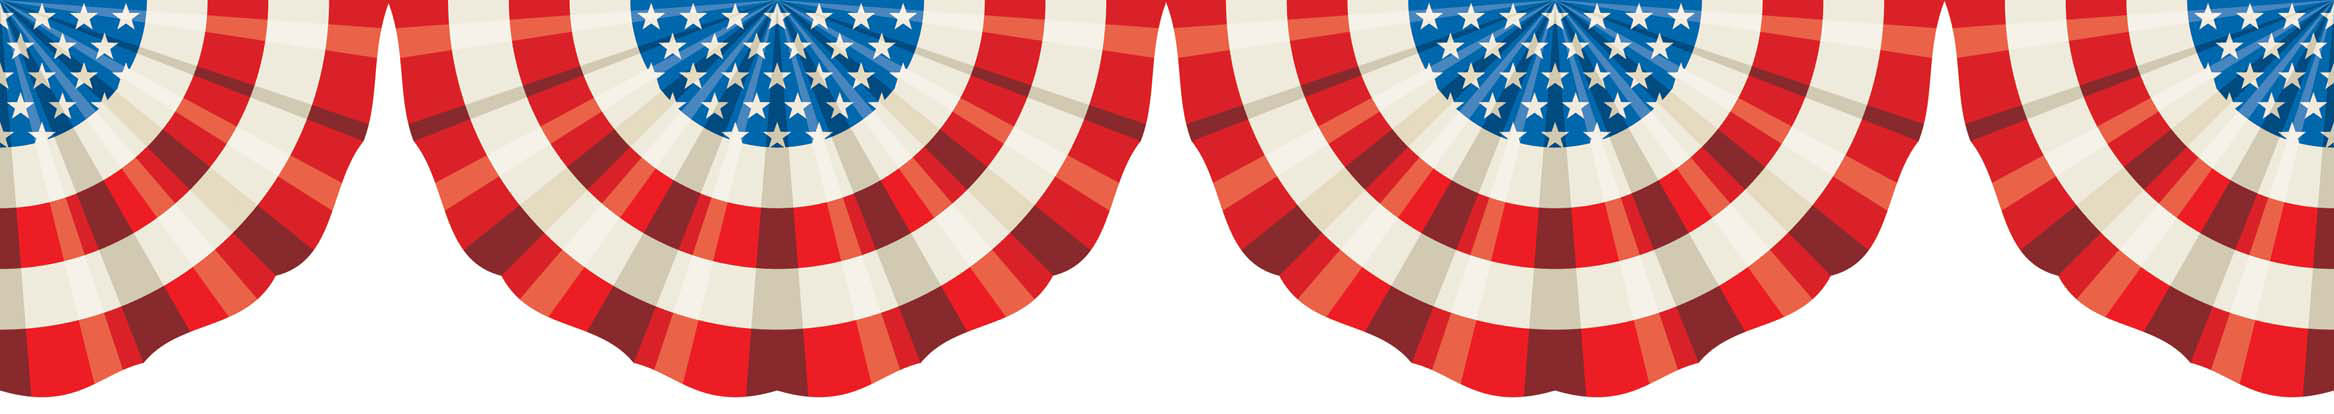 Free Patriotic Bunting Cliparts, Download Free Clip Art.